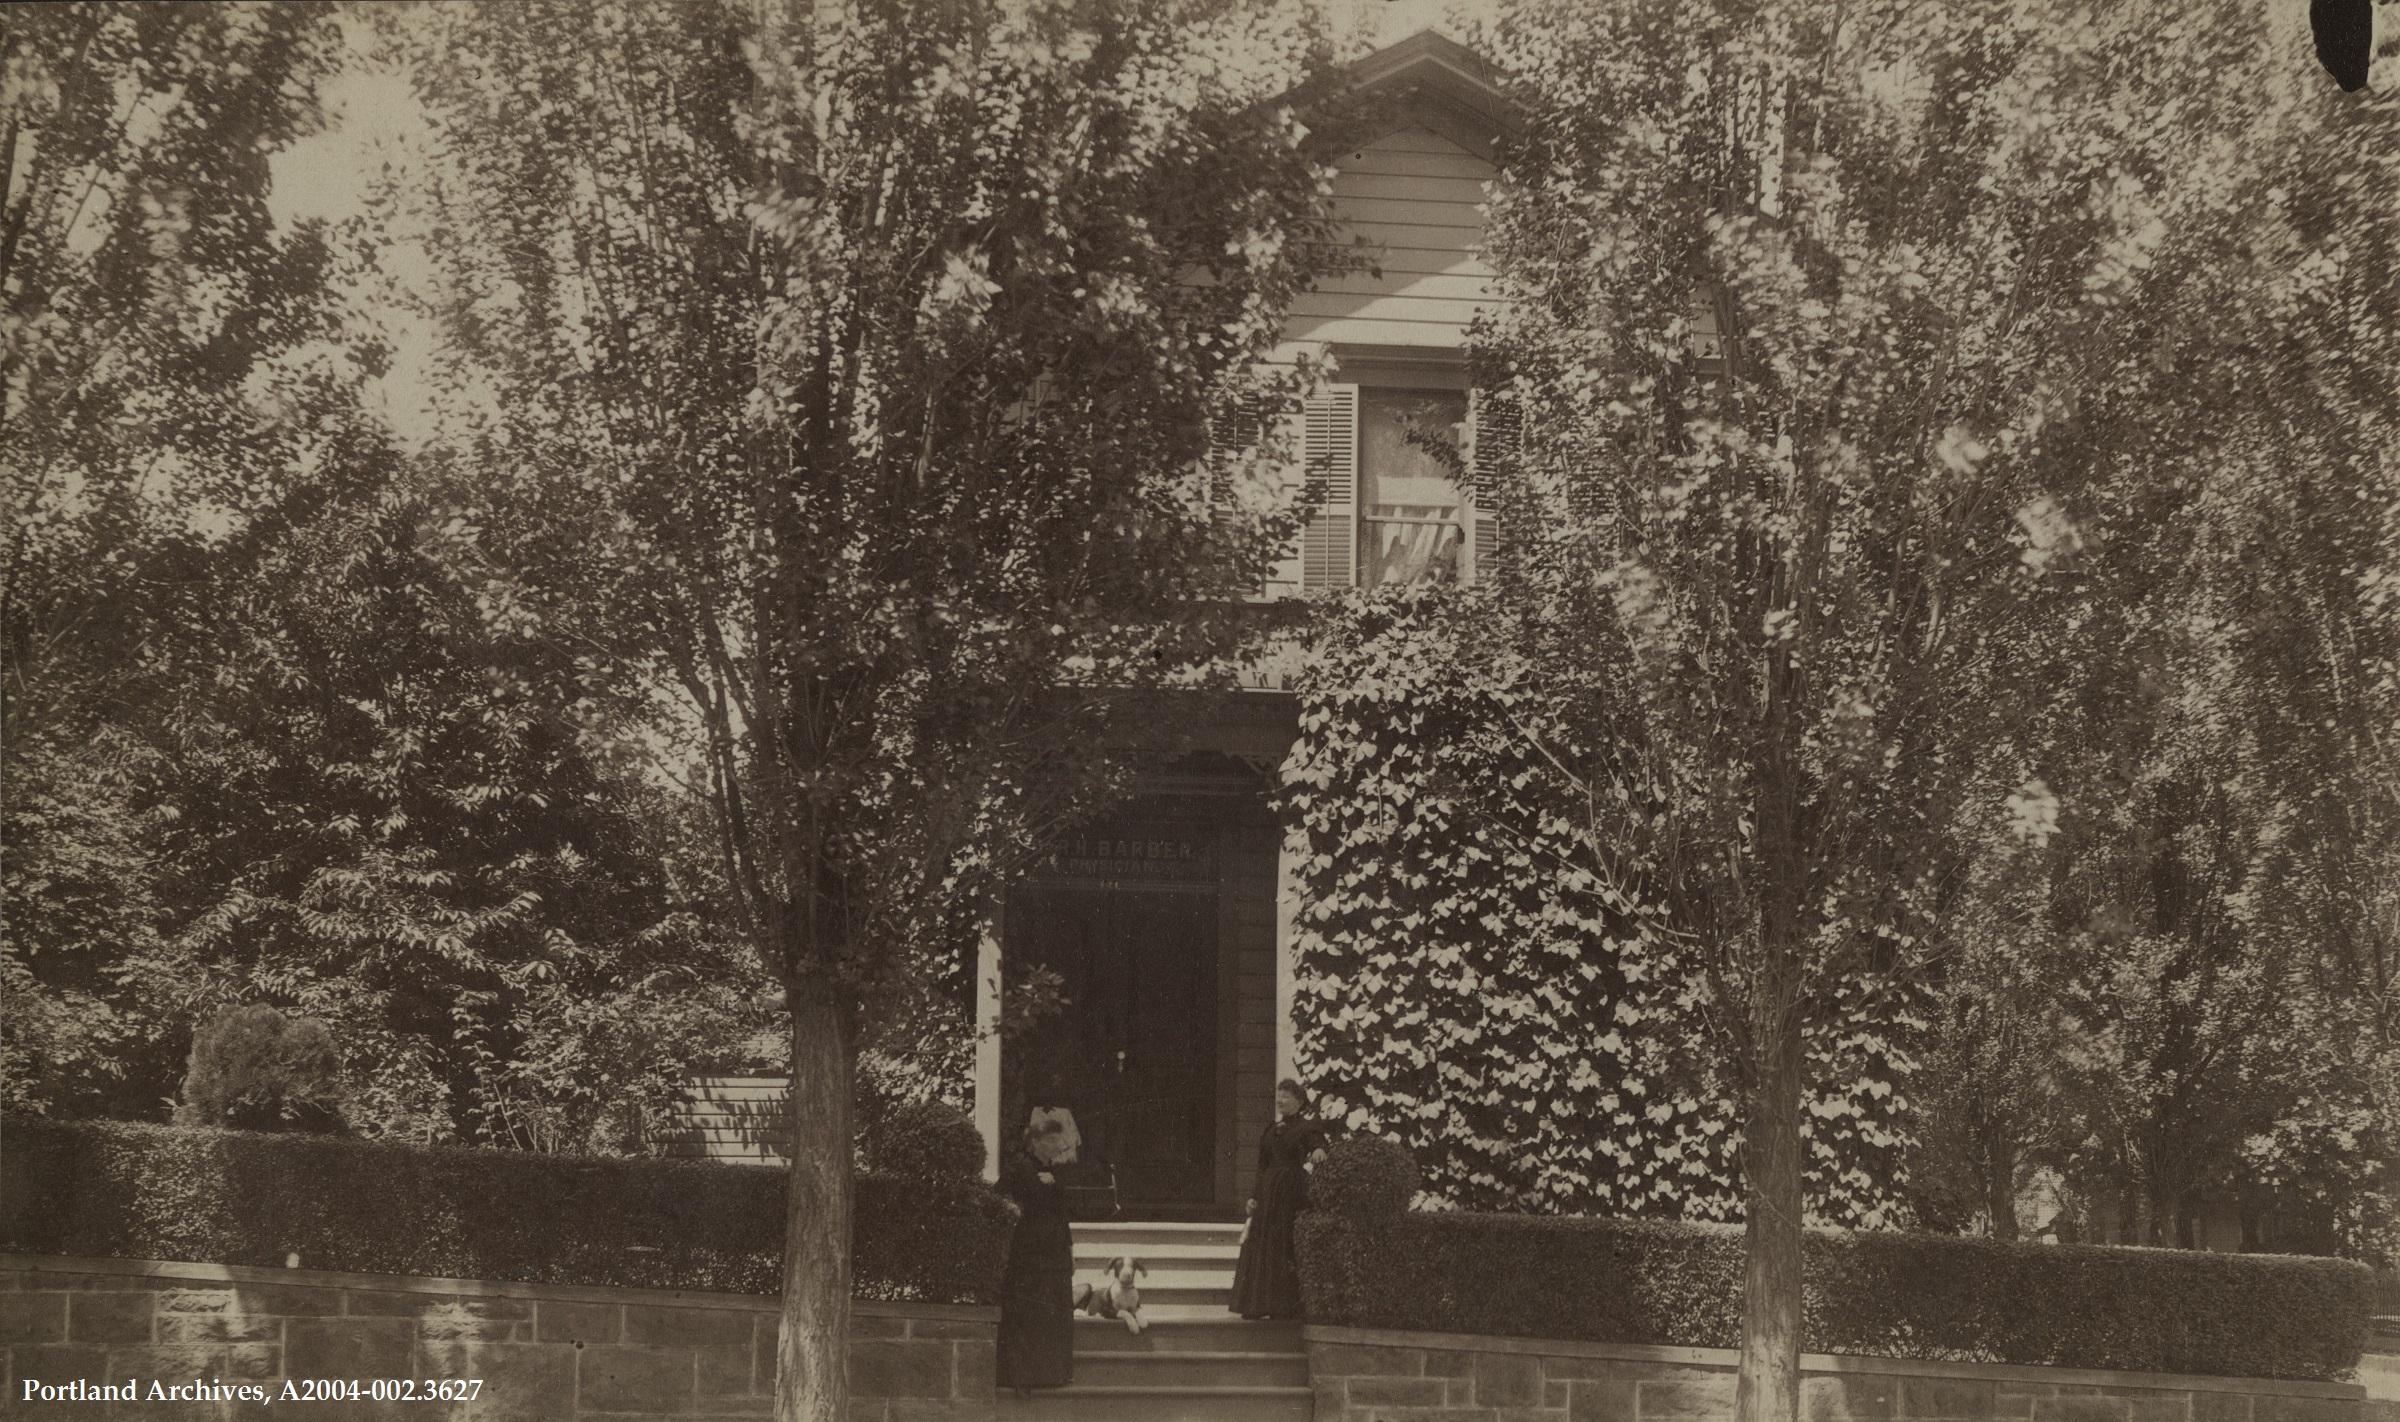 City of Portland Archives, Oregon, A2004-002.3627